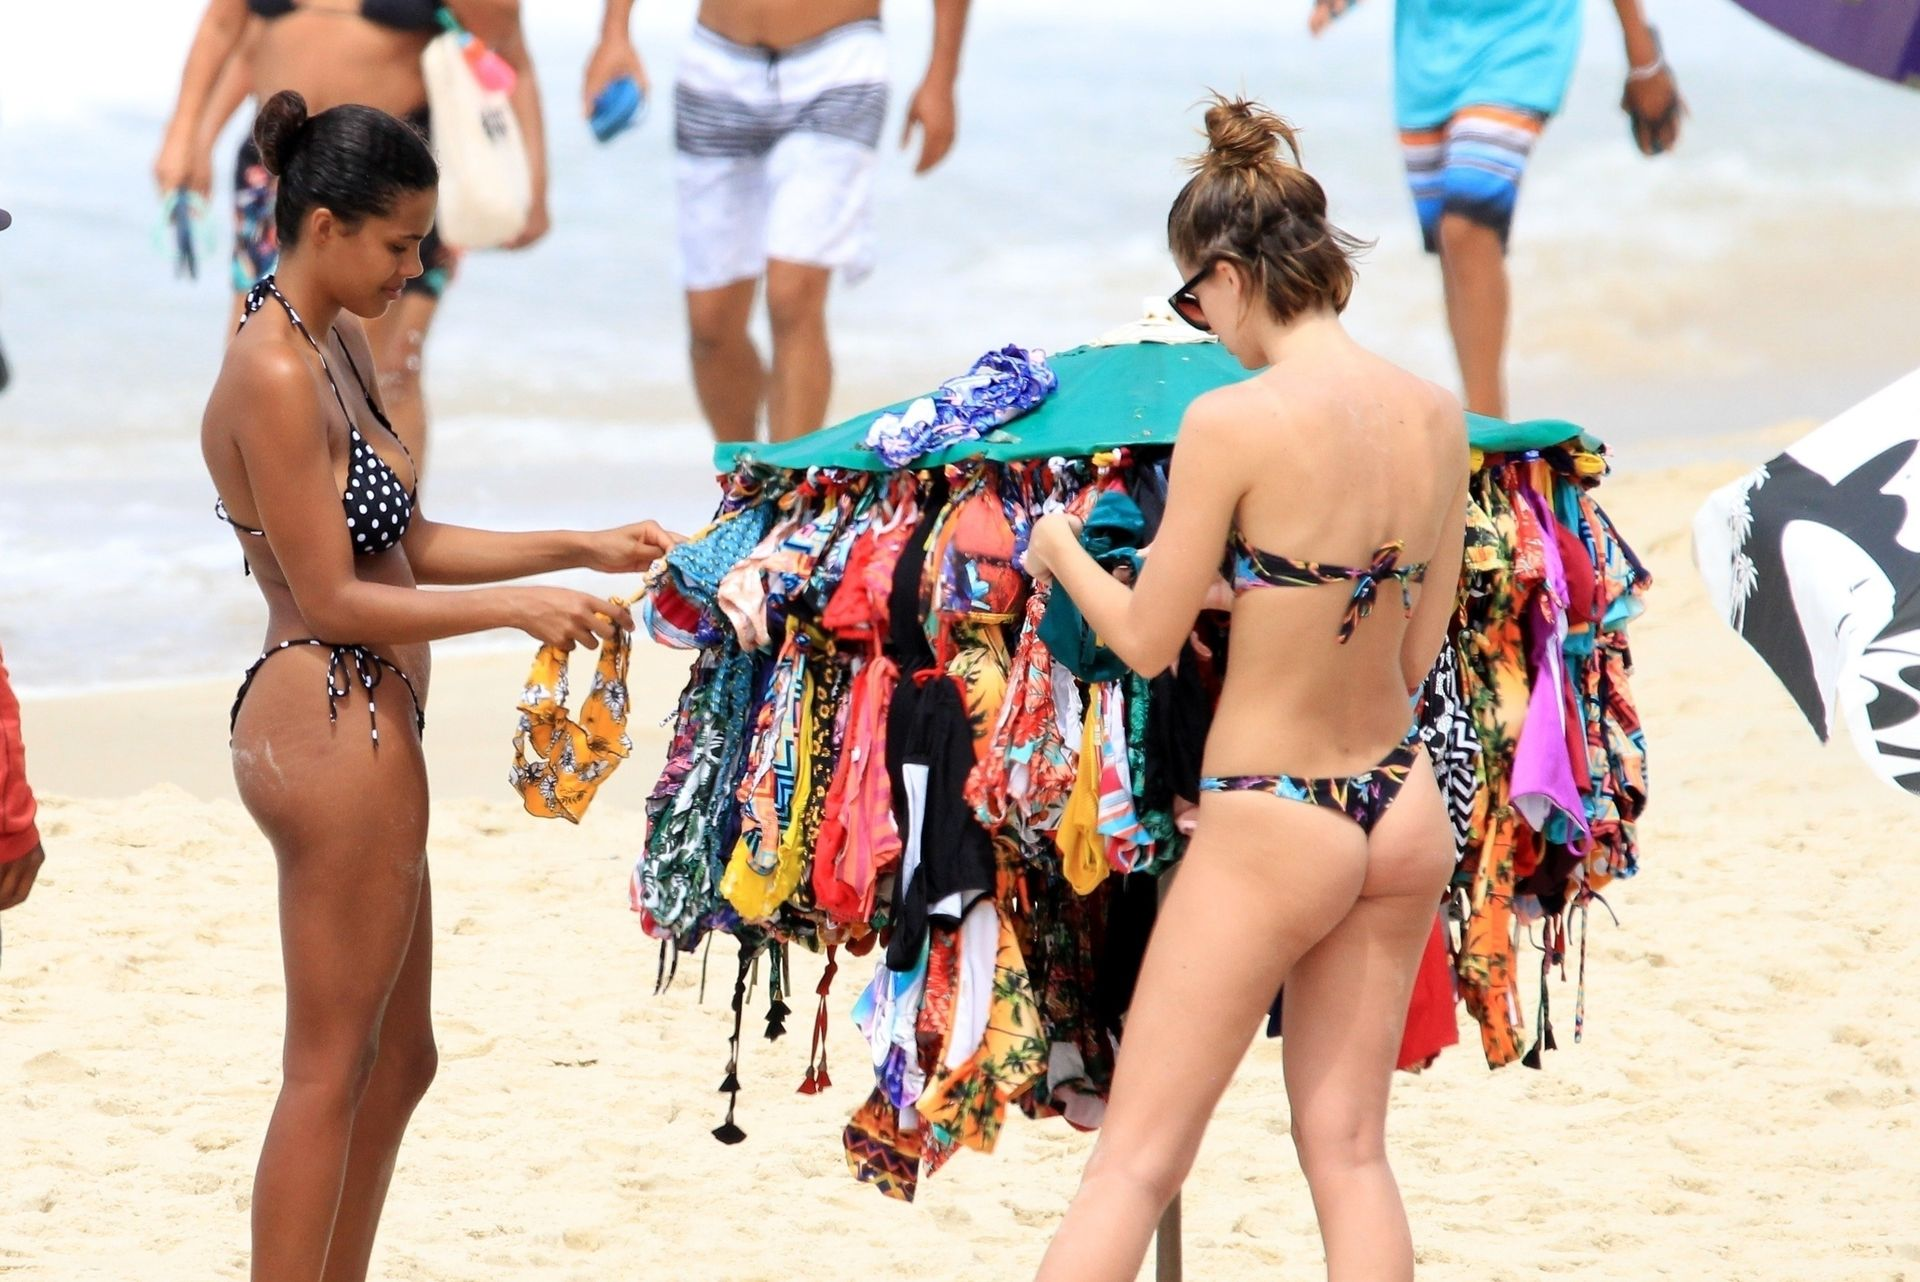 Tina Kunakey Nearly Nip Slip While Frolicking On The Beach In Rio 0066